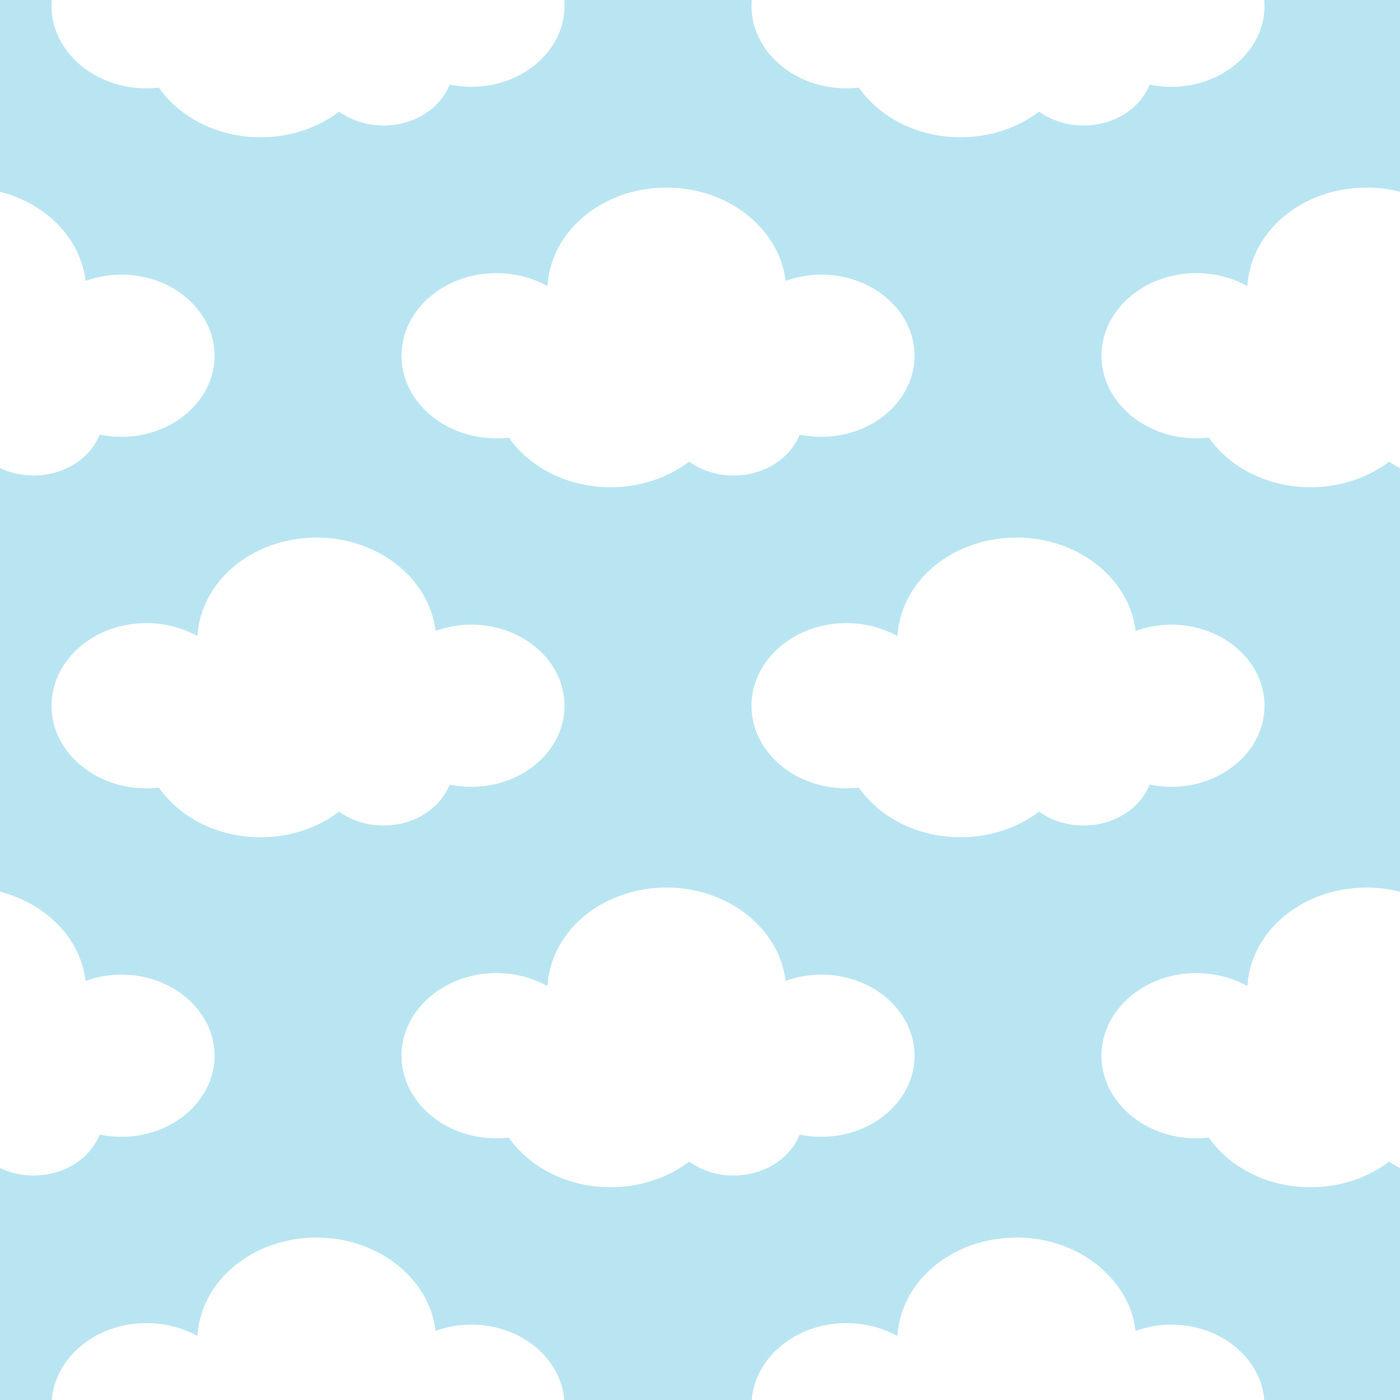 Sky Backgrounds (46+ images)  |Light Blue Sky Clouds